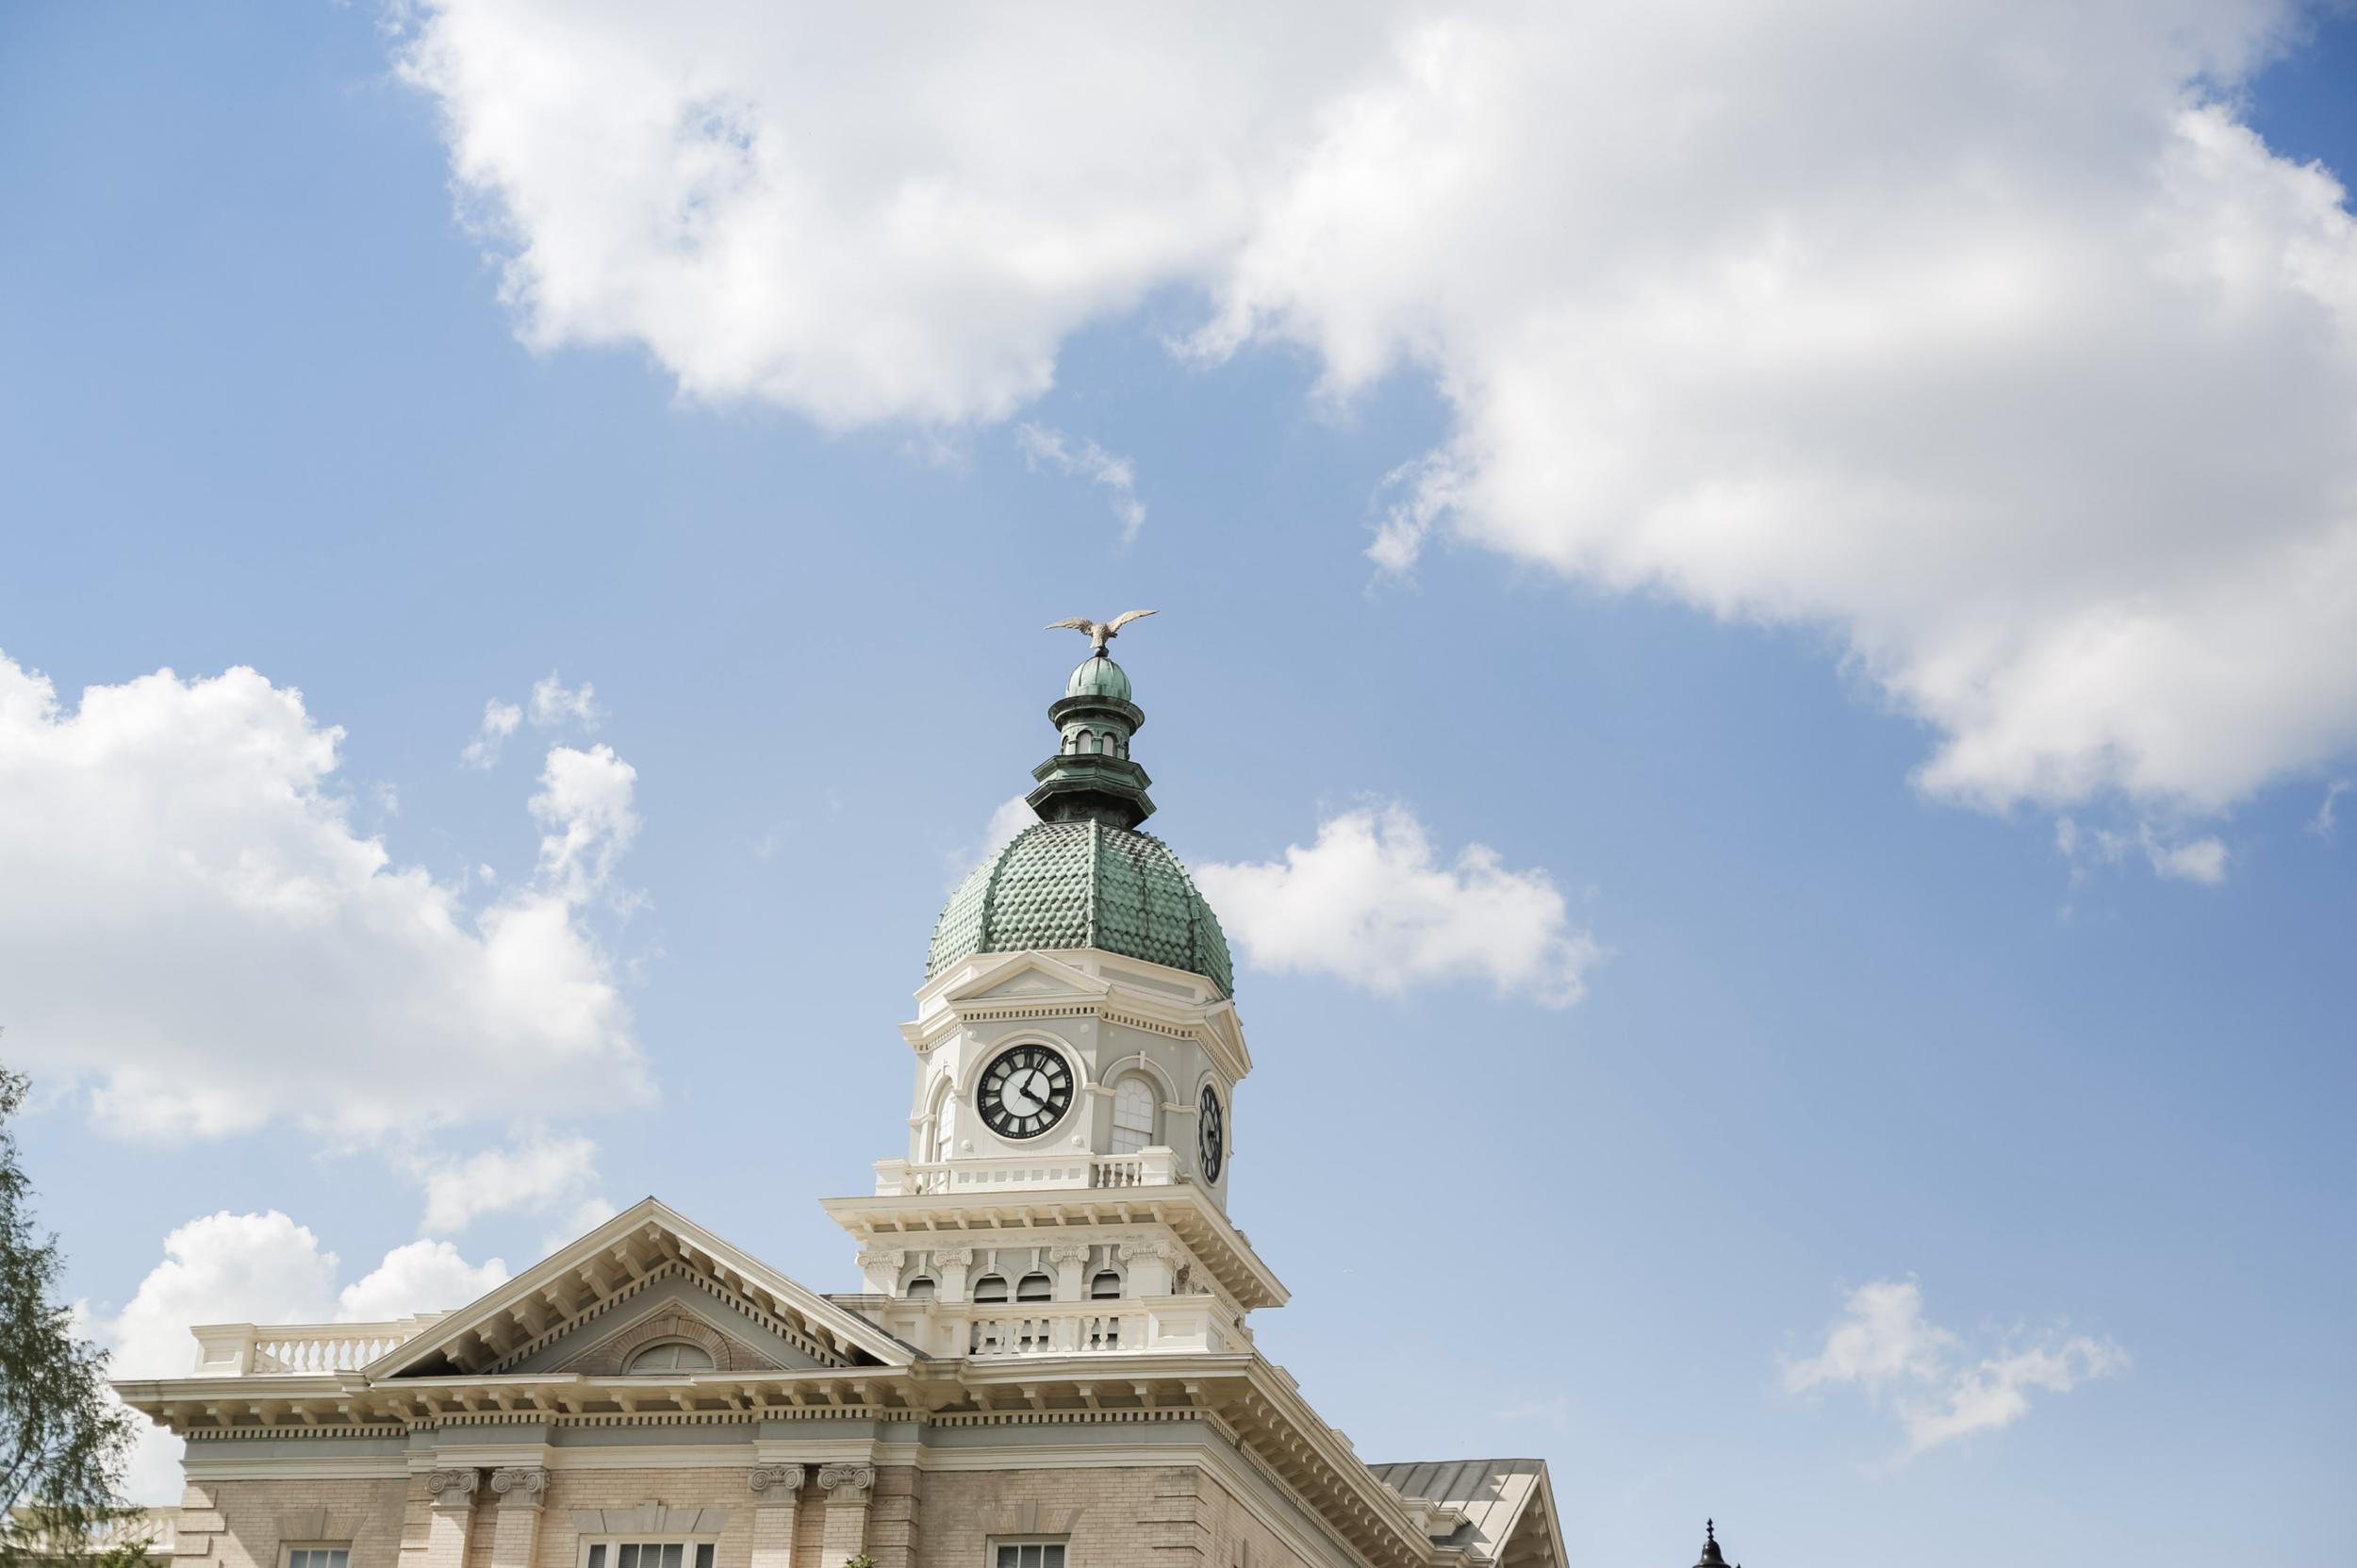 City Hall. Athens, GA. Spring 2017